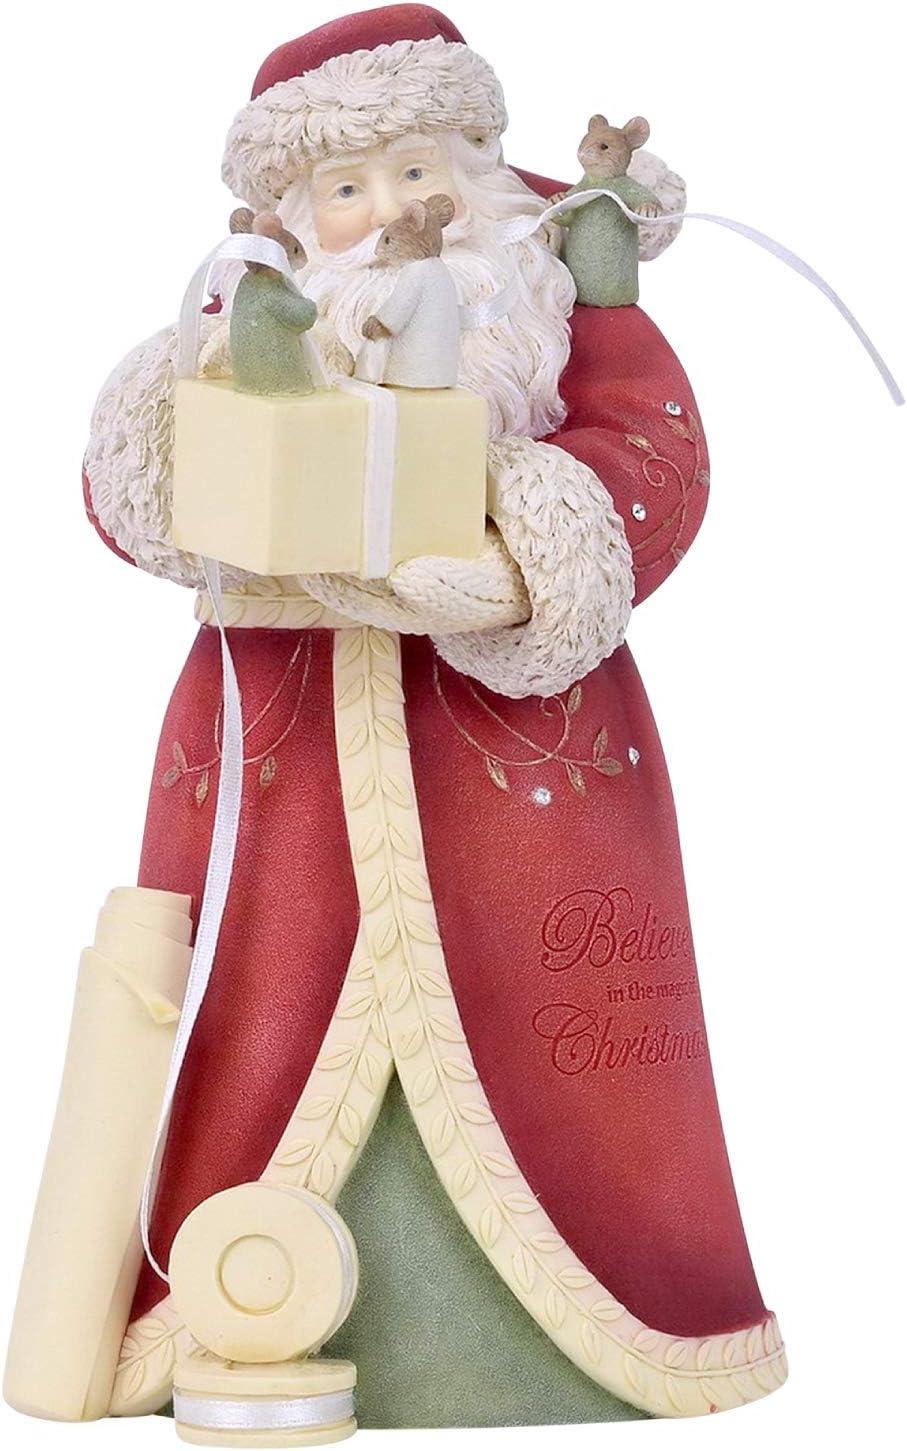 Enesco Heart of Tampa Mall Christmas a Perfect Bow Santa Inc Figurine 7.95 Bombing free shipping